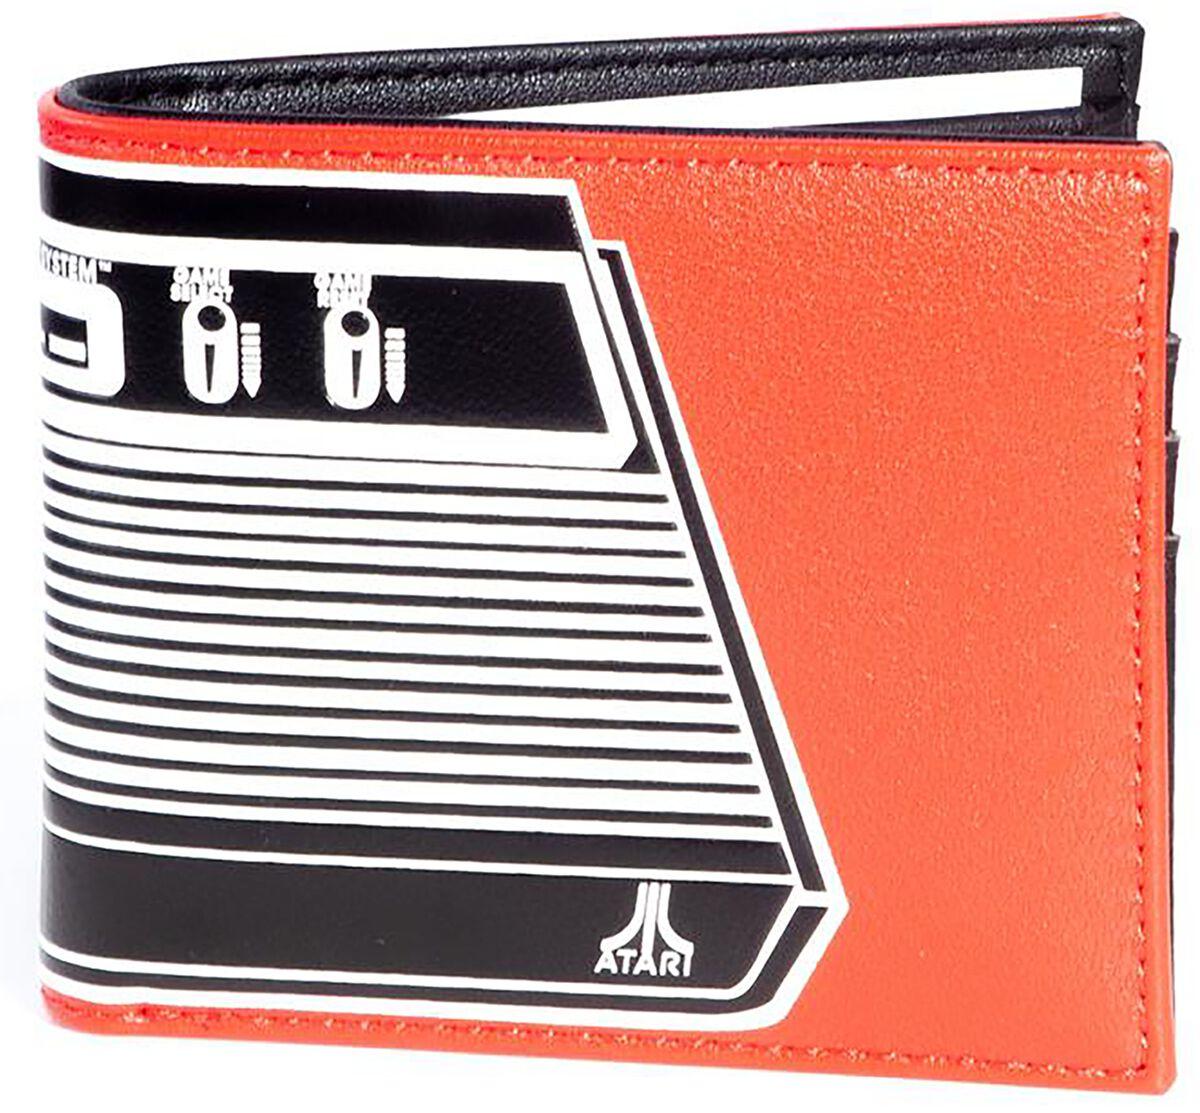 Image of Atari Console Geldbörse orange